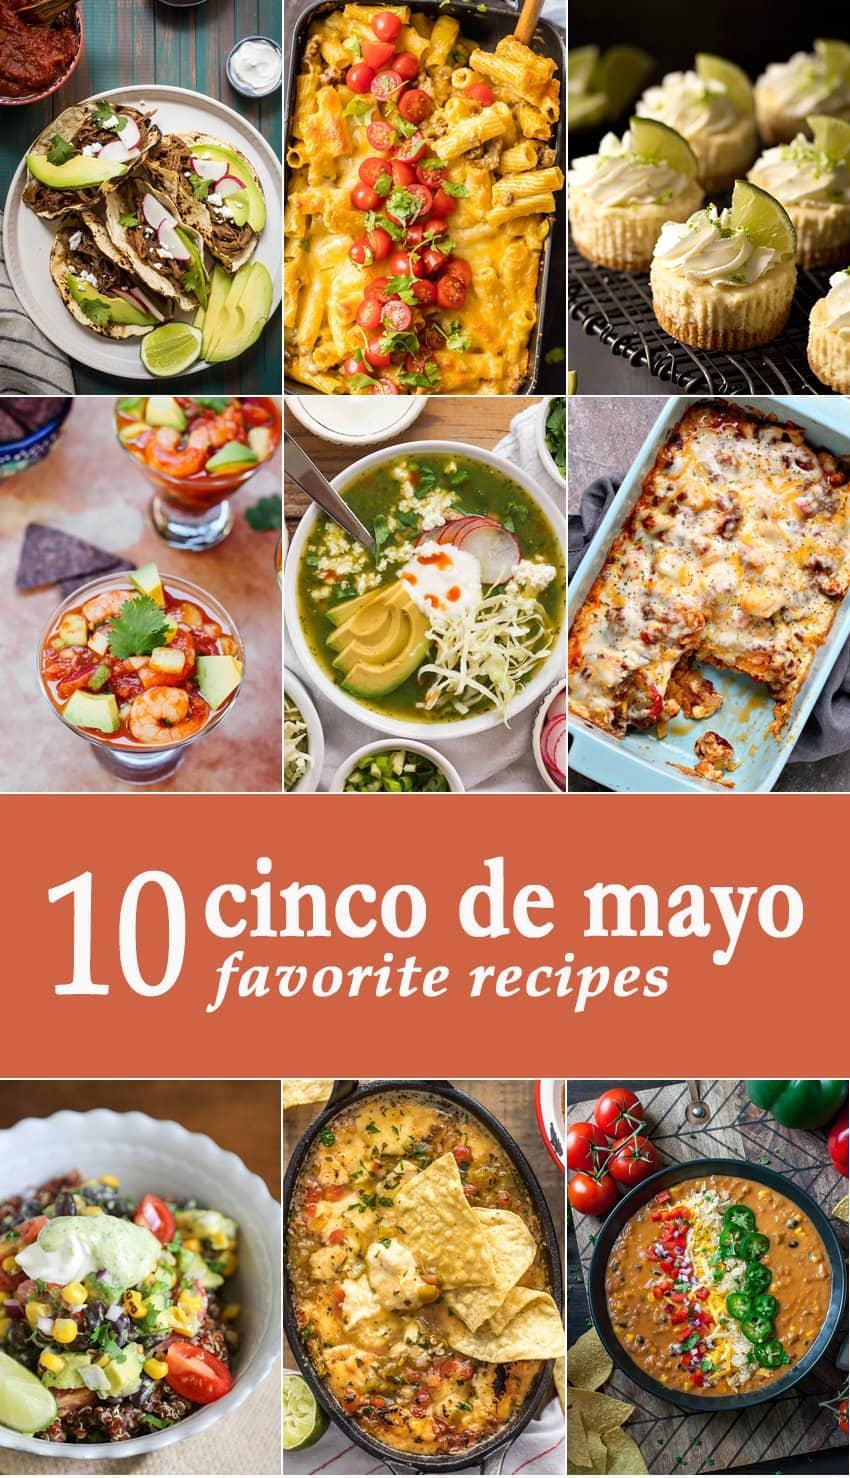 10 Favorite Cinco de Mayo Recipes